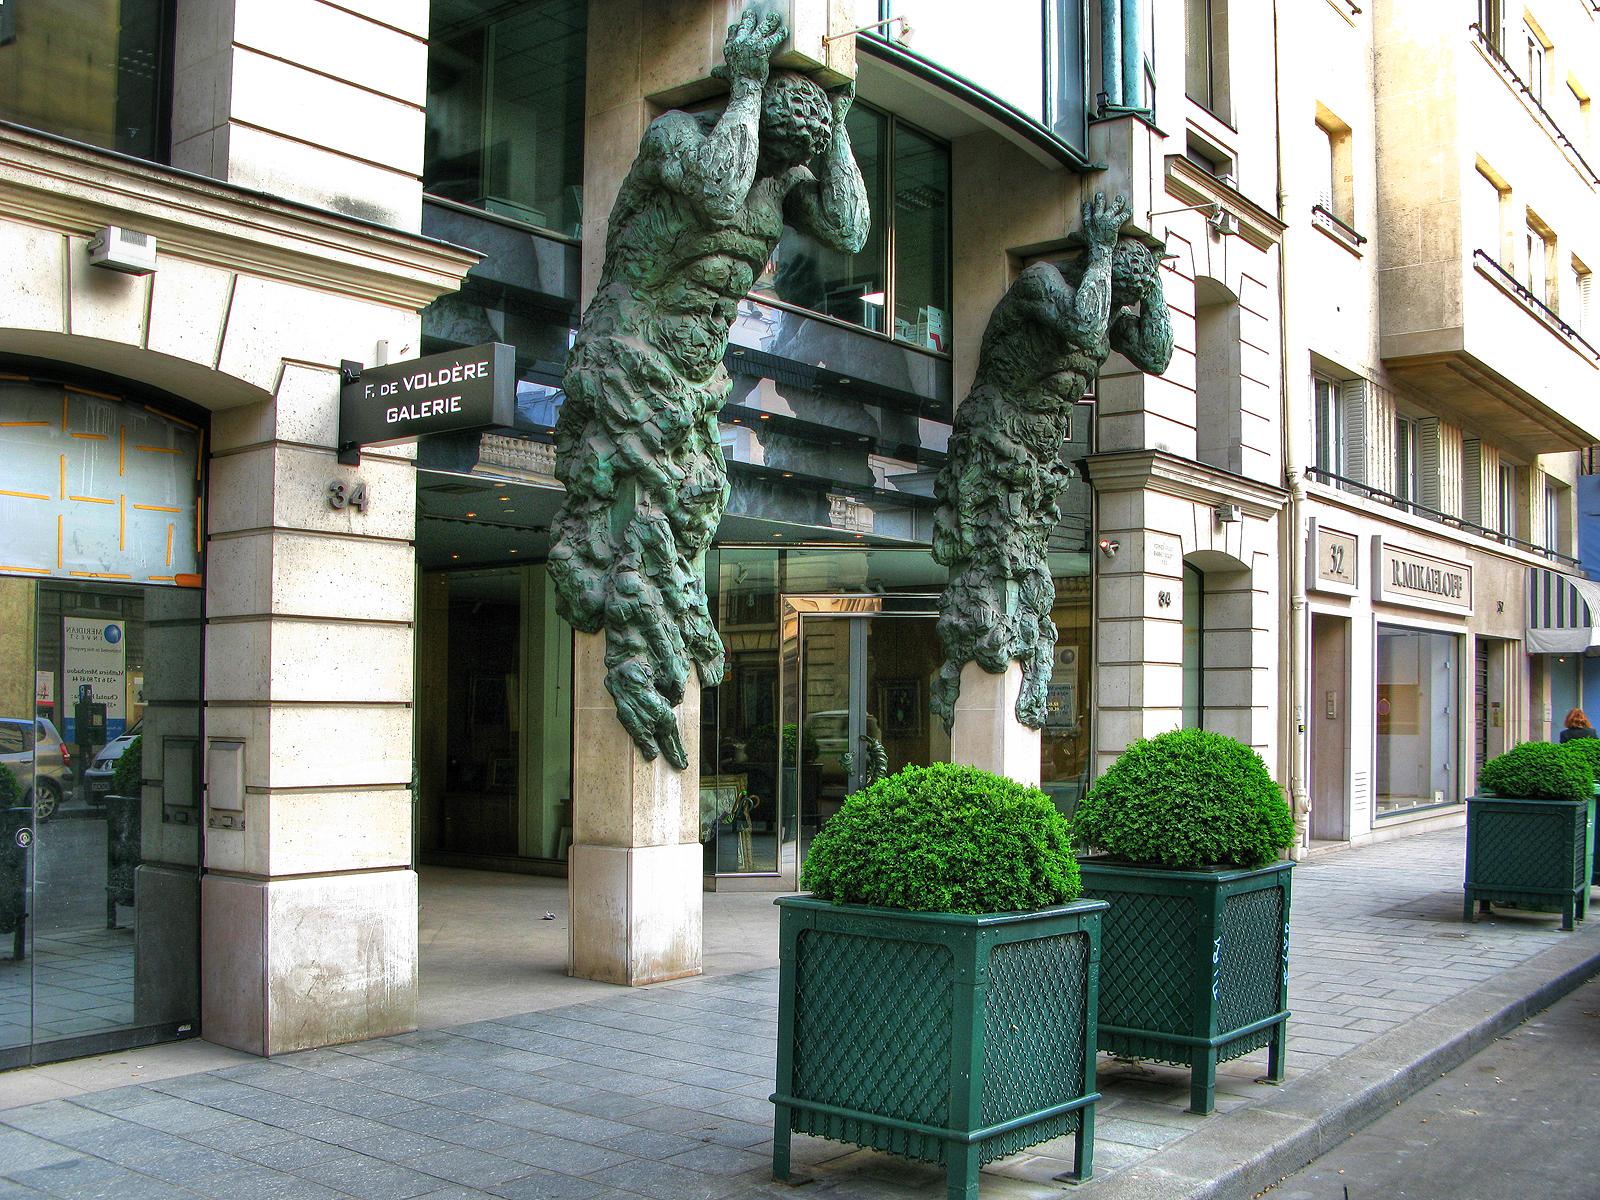 Galerie Florence de Voldere